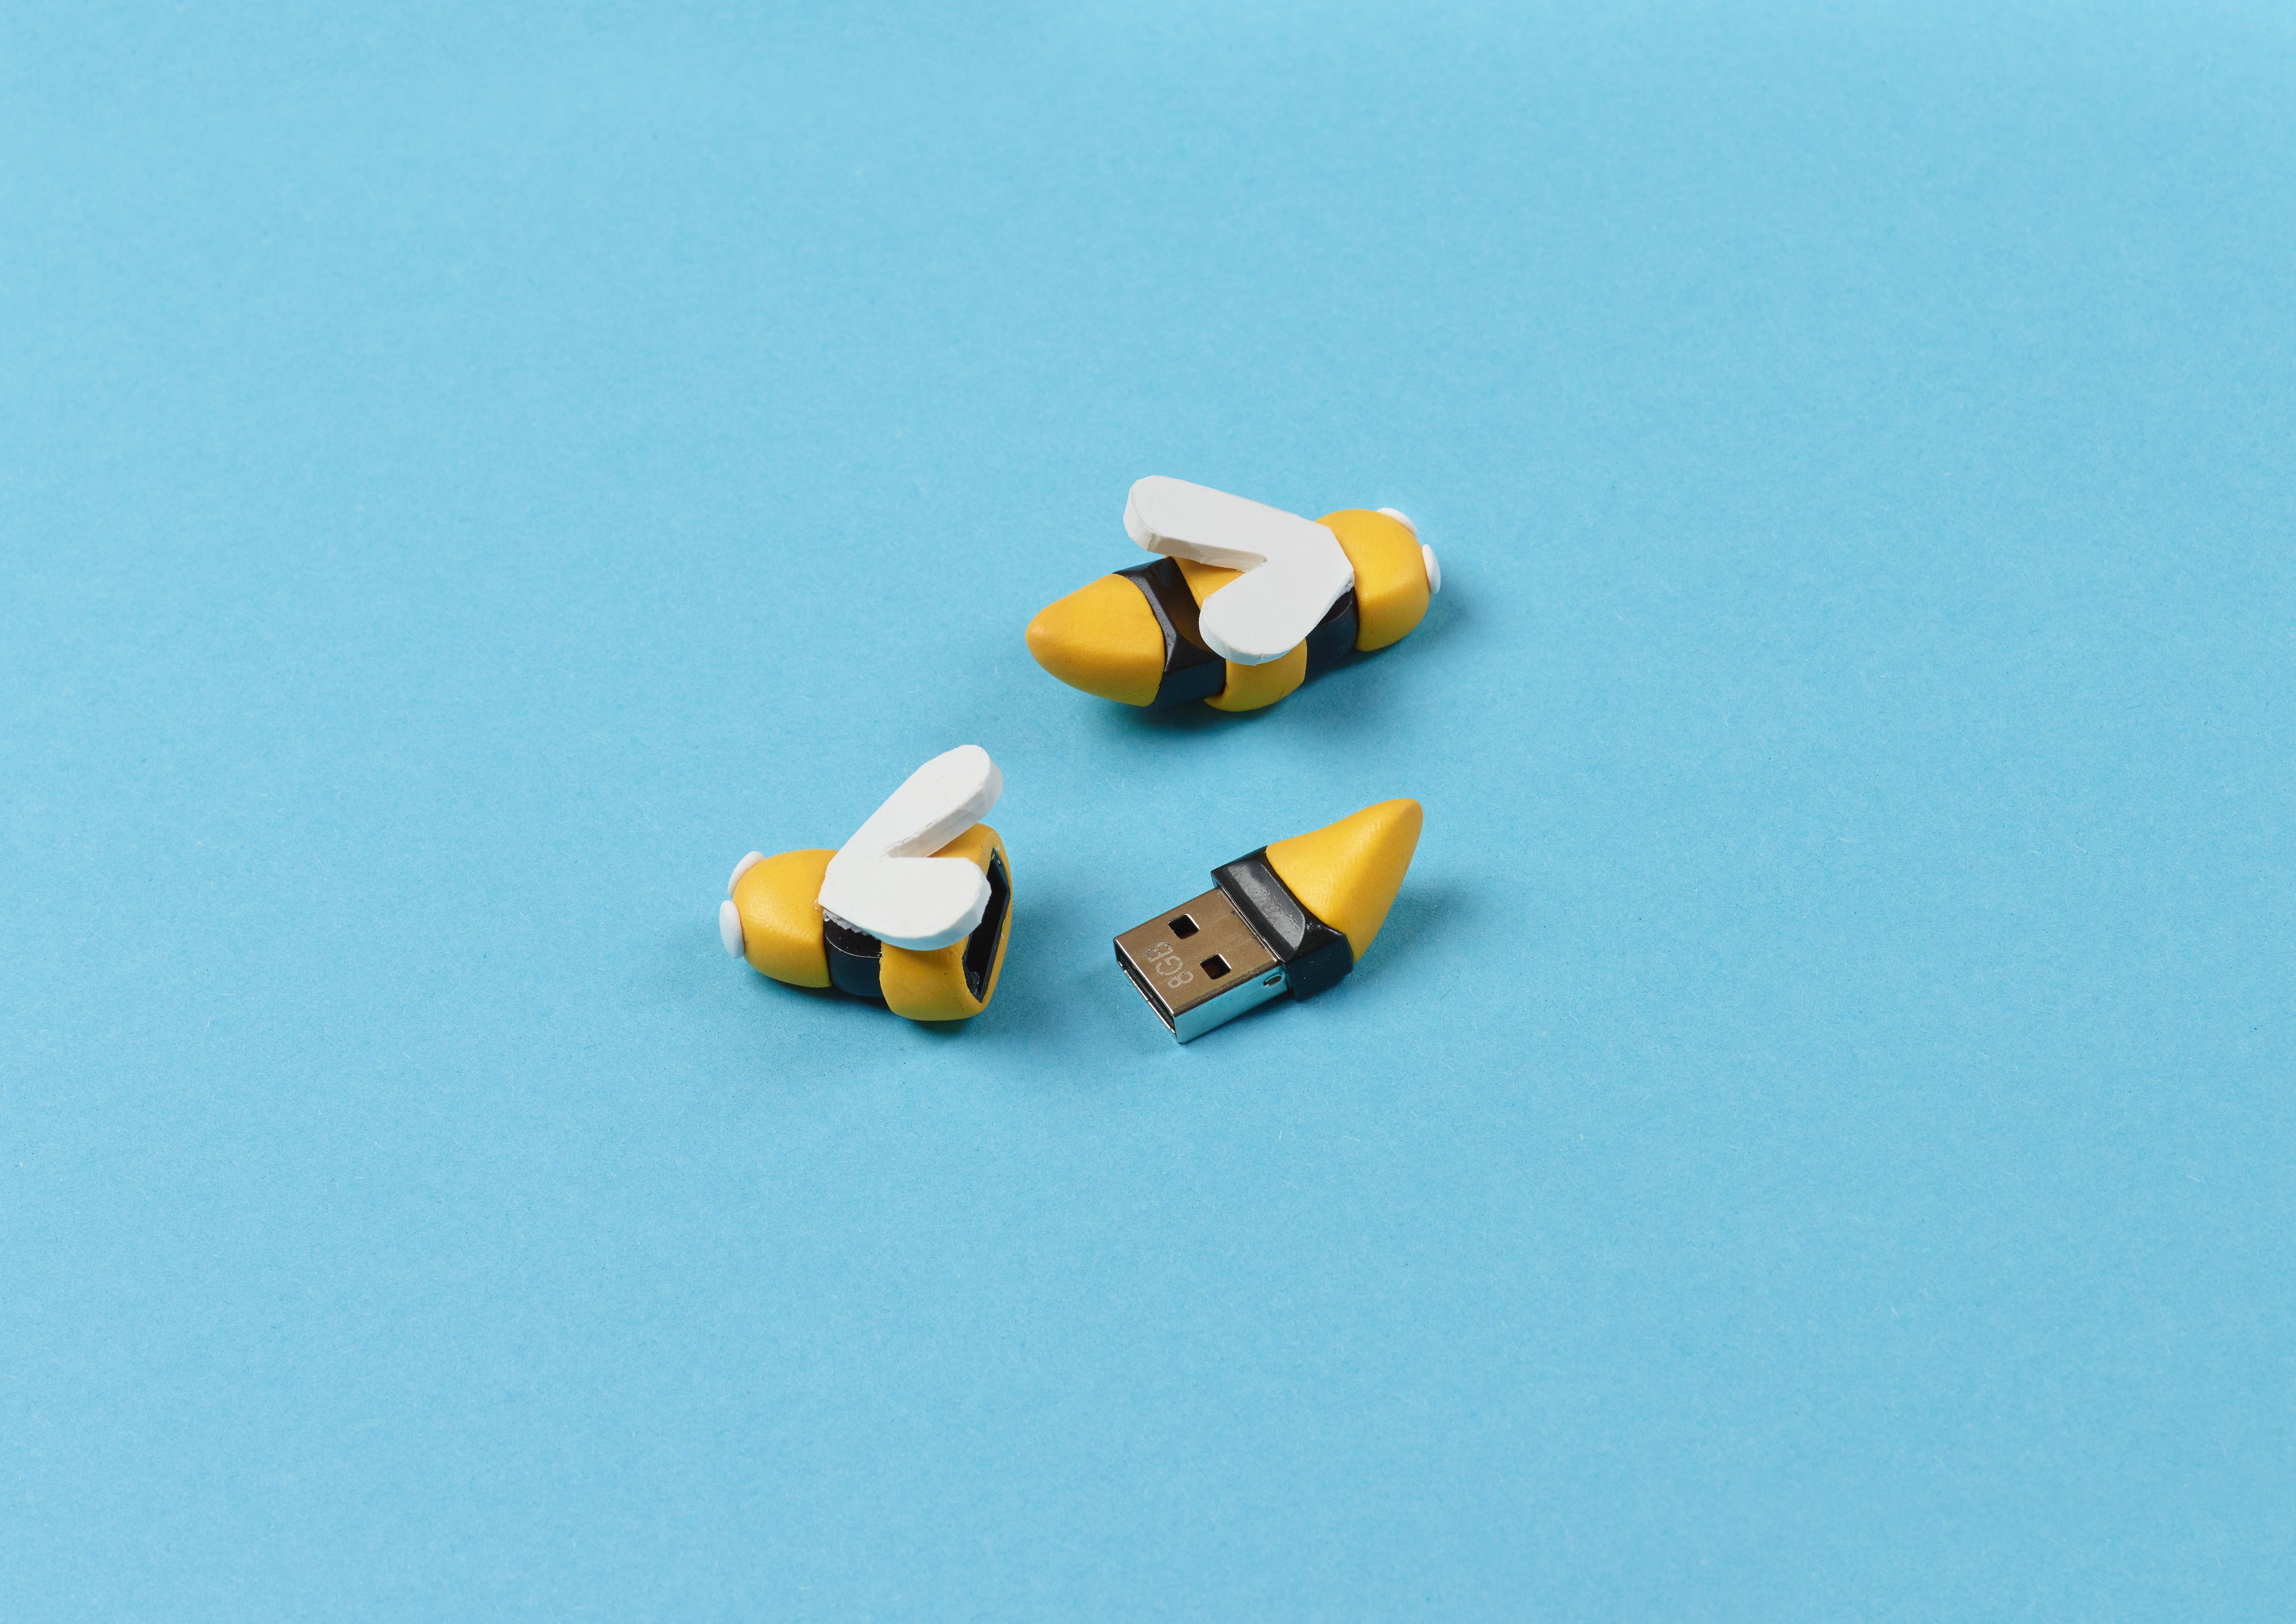 USB designed to look like a bee using Sugru